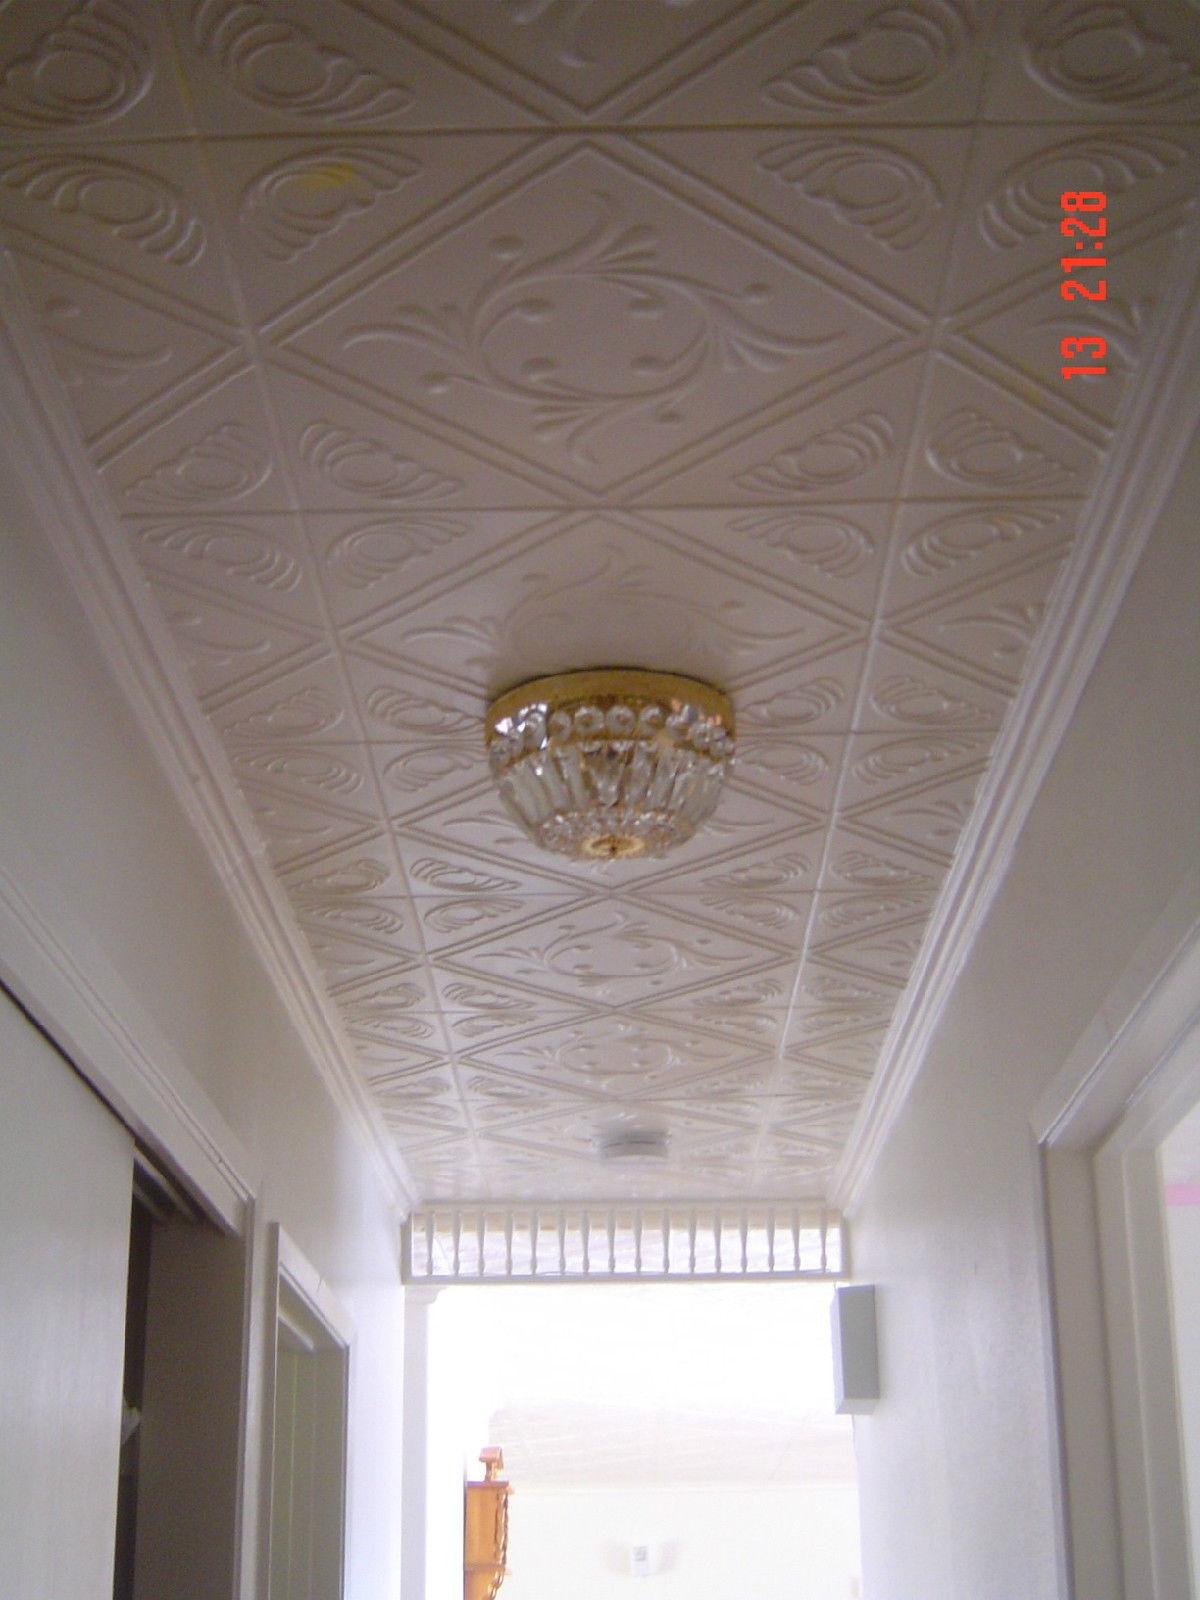 Styrofoam Ceiling Tile For Diy Home Decor And 50 Similar Items